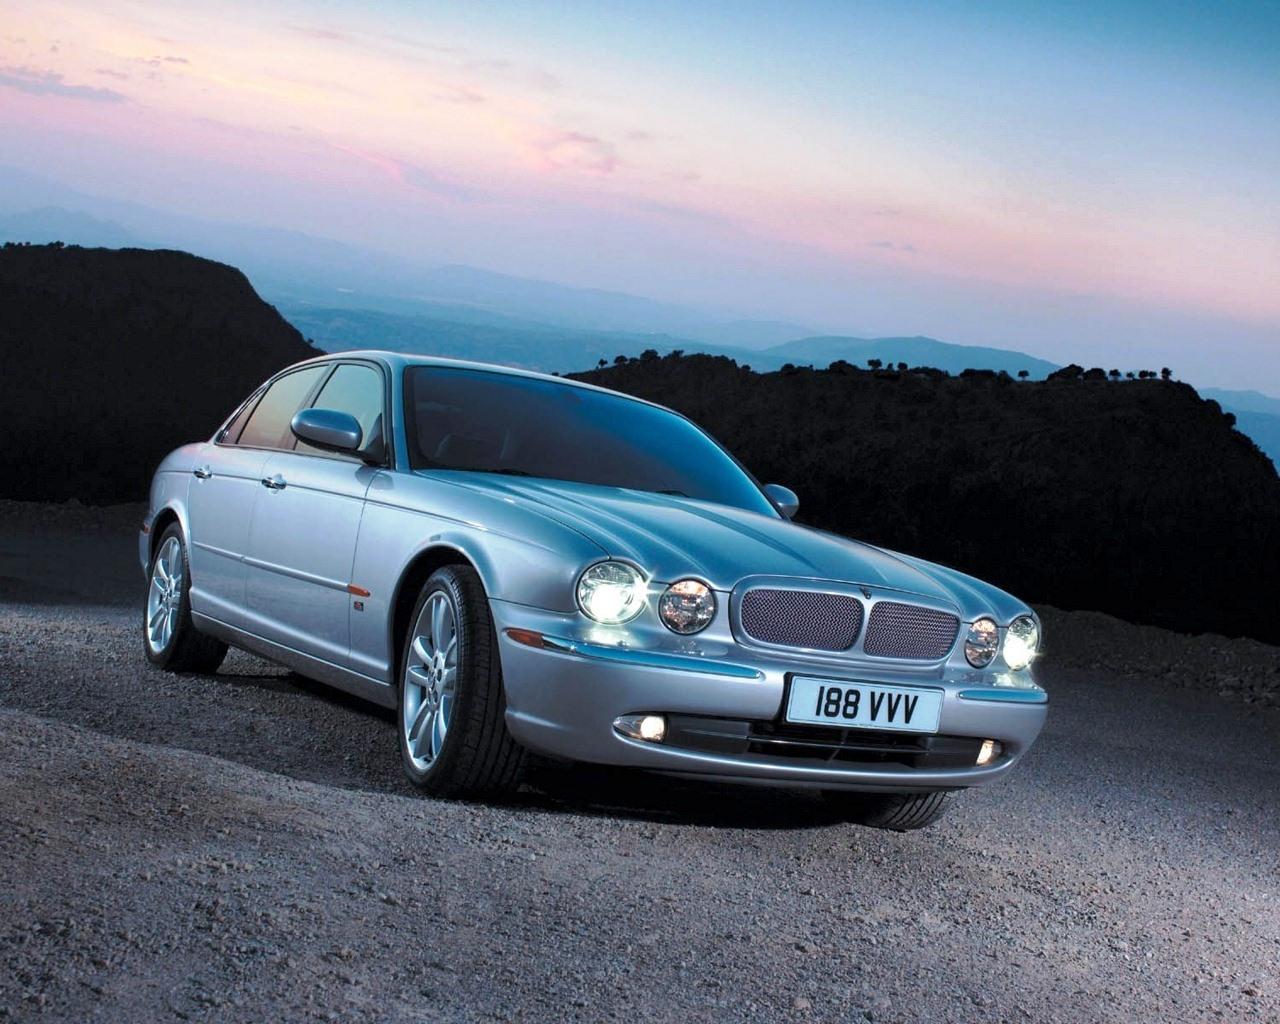 http://3.bp.blogspot.com/-wcerKEhmuTg/T6HyFDaf7VI/AAAAAAAABMs/ZV7YRGaGTRQ/s1600/Jaguar_HD_Car_Wallpaper_Blu_Ray_1080p+%252839%2529.jpg